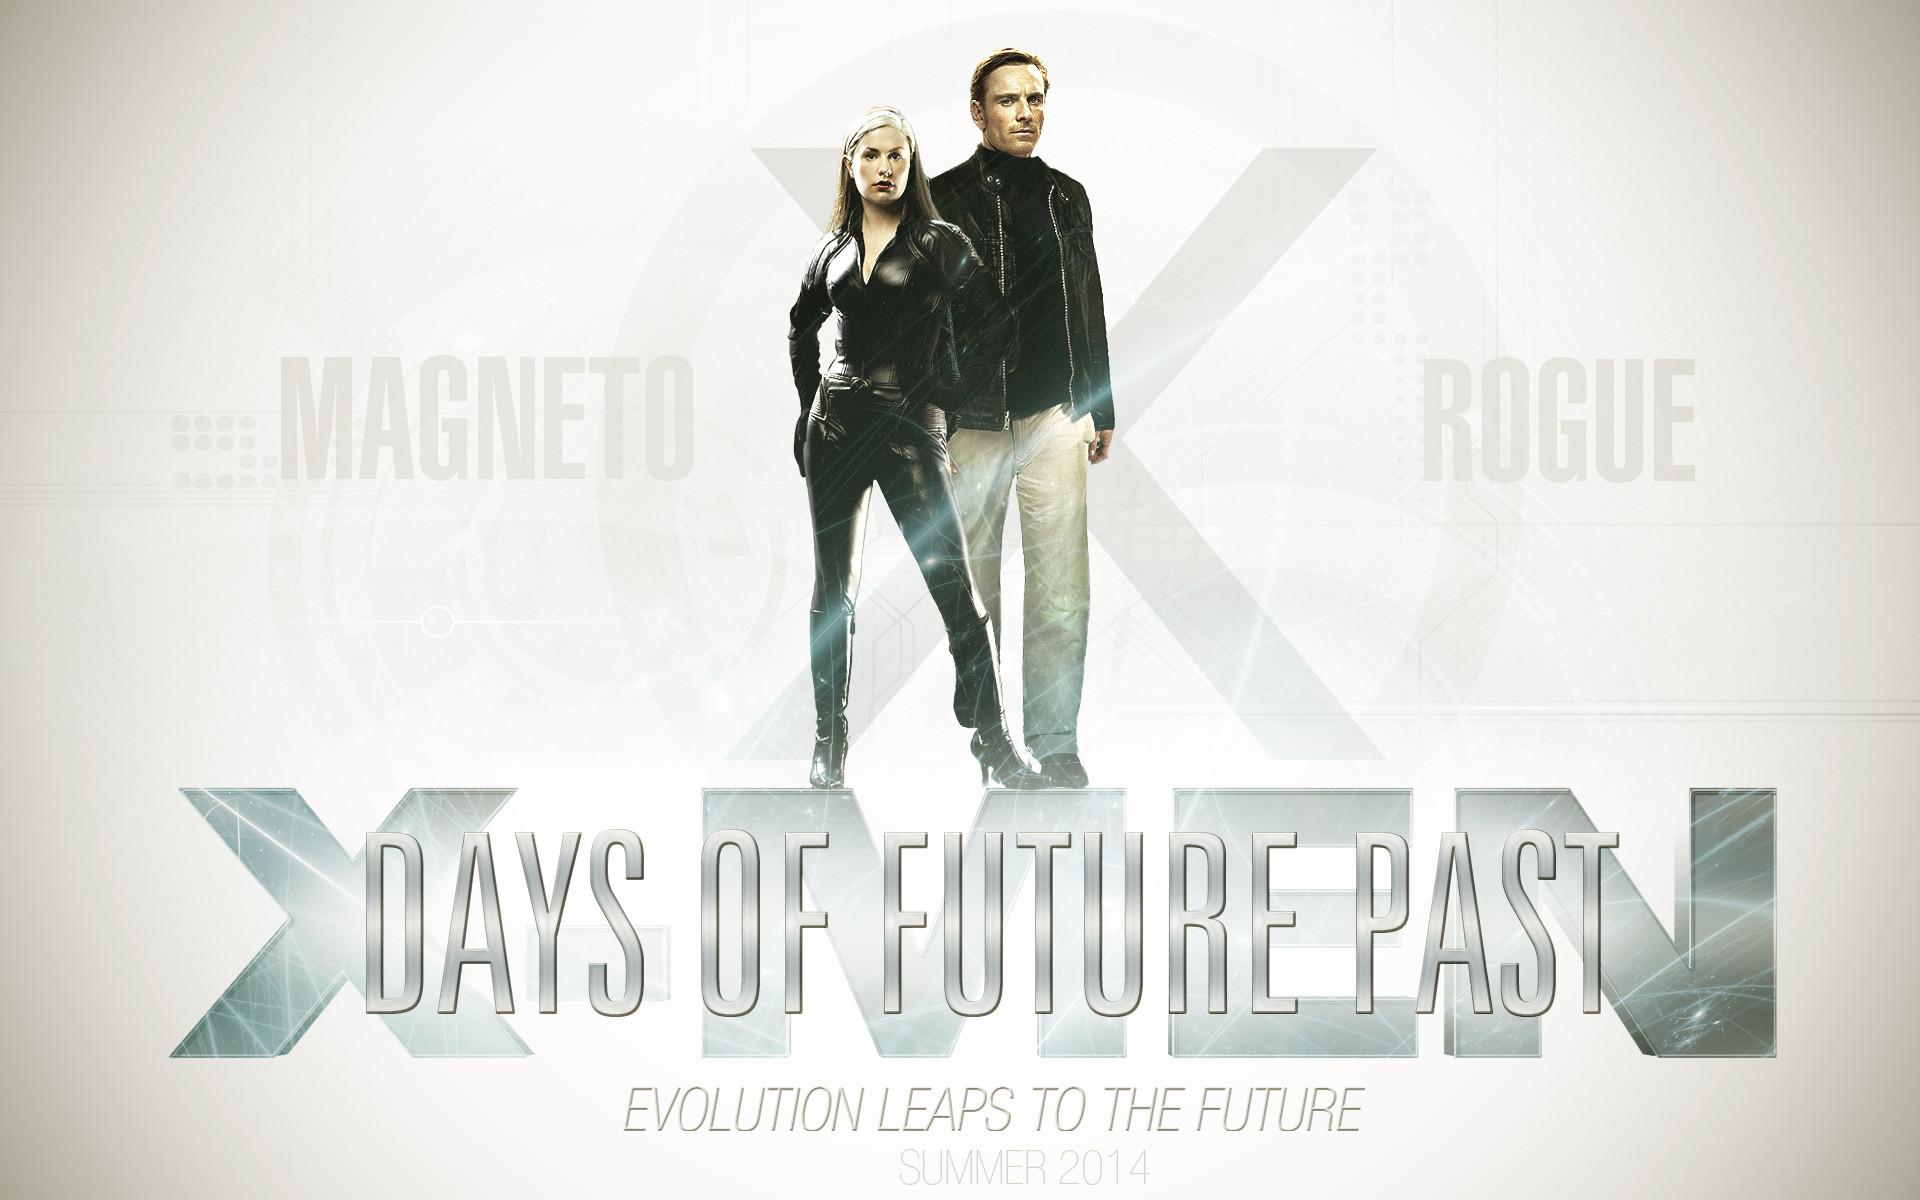 x men days of future past wallpaer